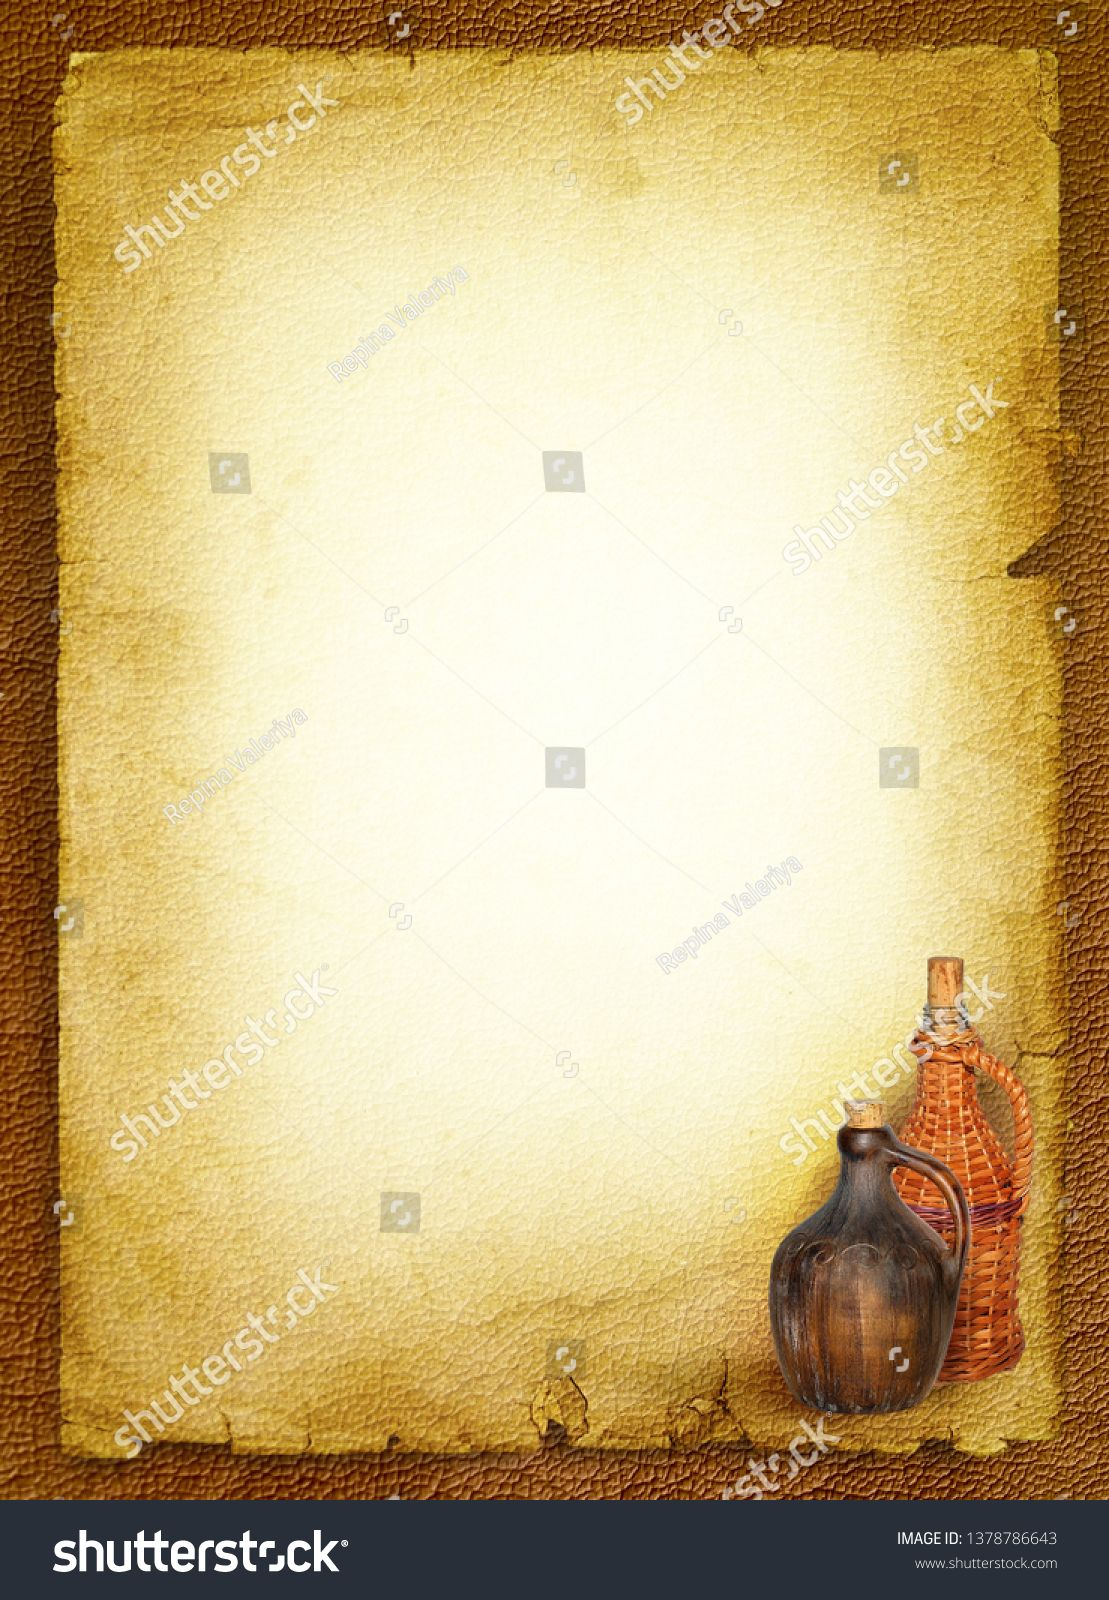 Wine list menu with jug and bottle at vintage paper background 1109x1600